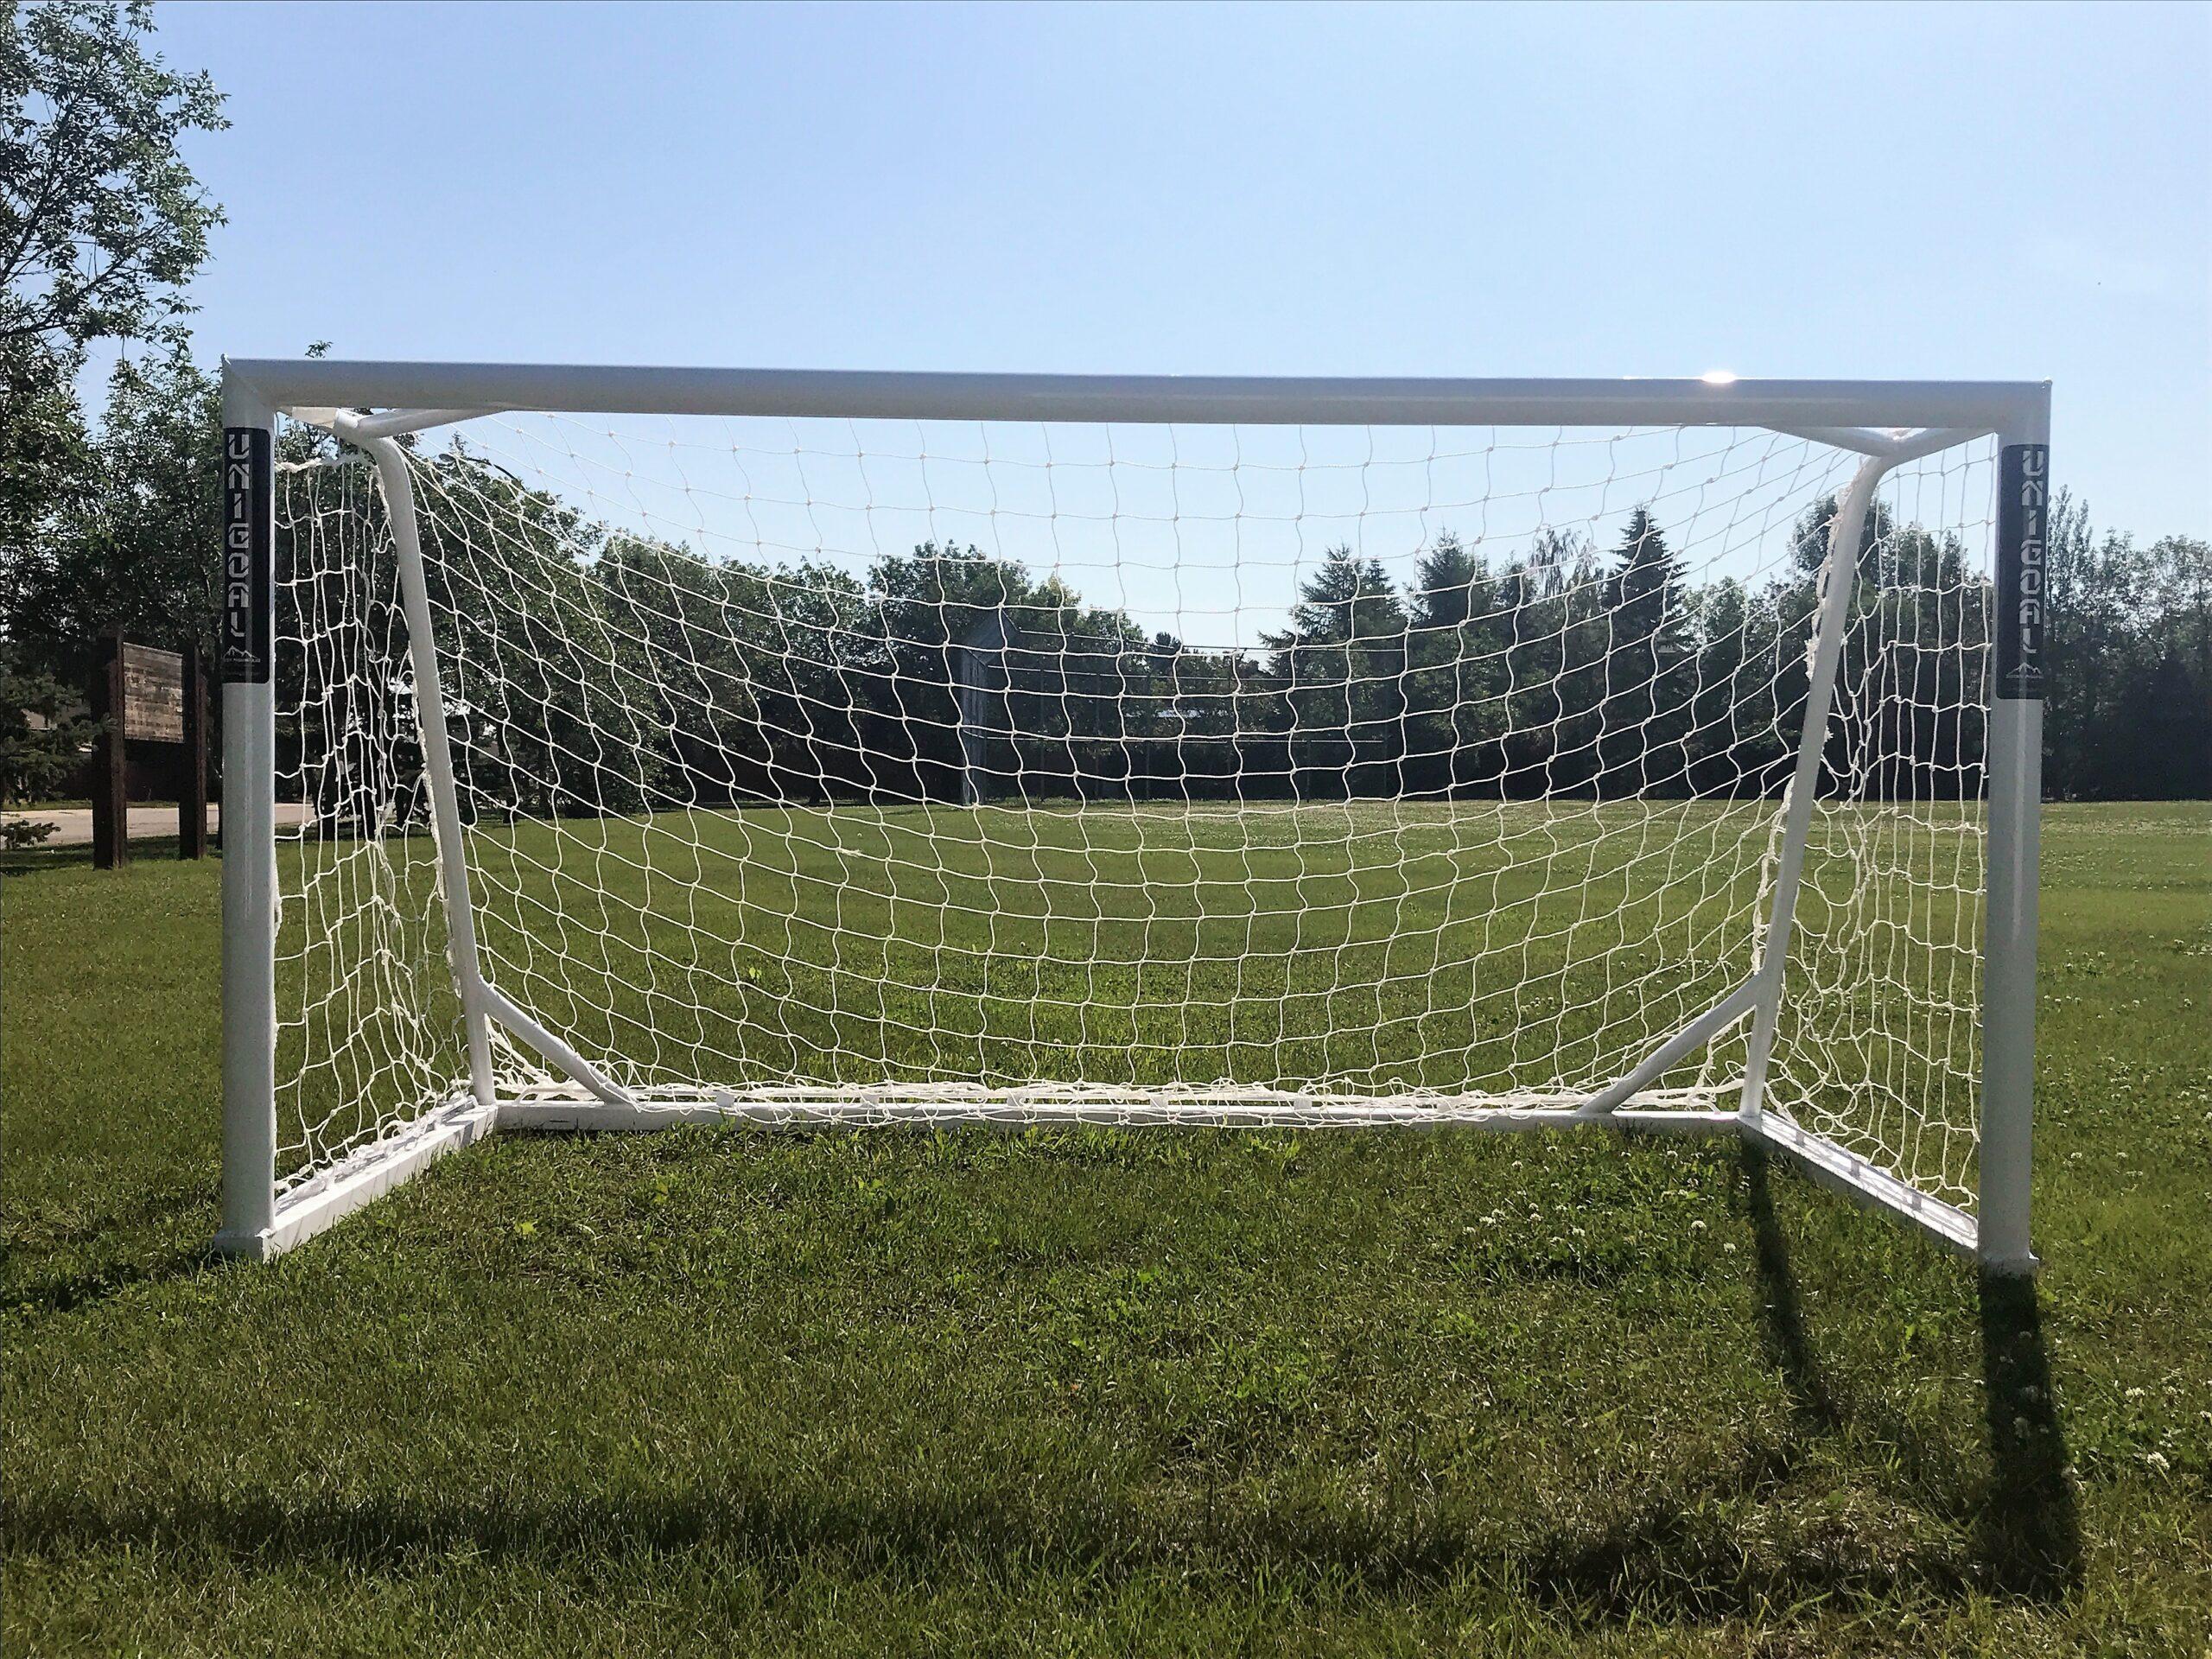 UNIGOAL soccer net